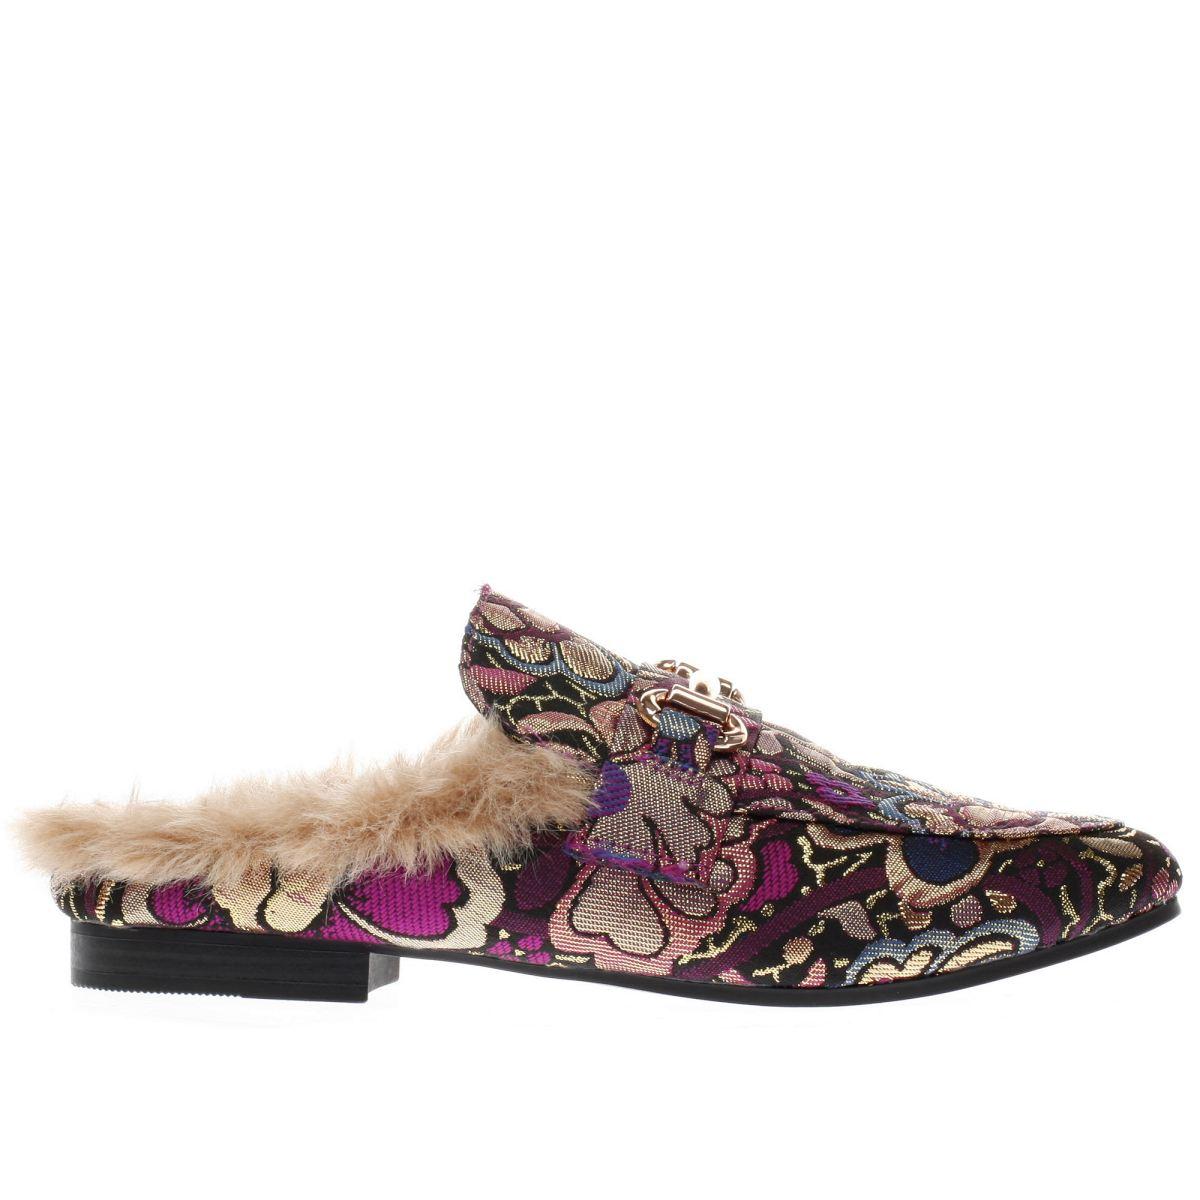 schuh purple & gold posh flower flat shoes